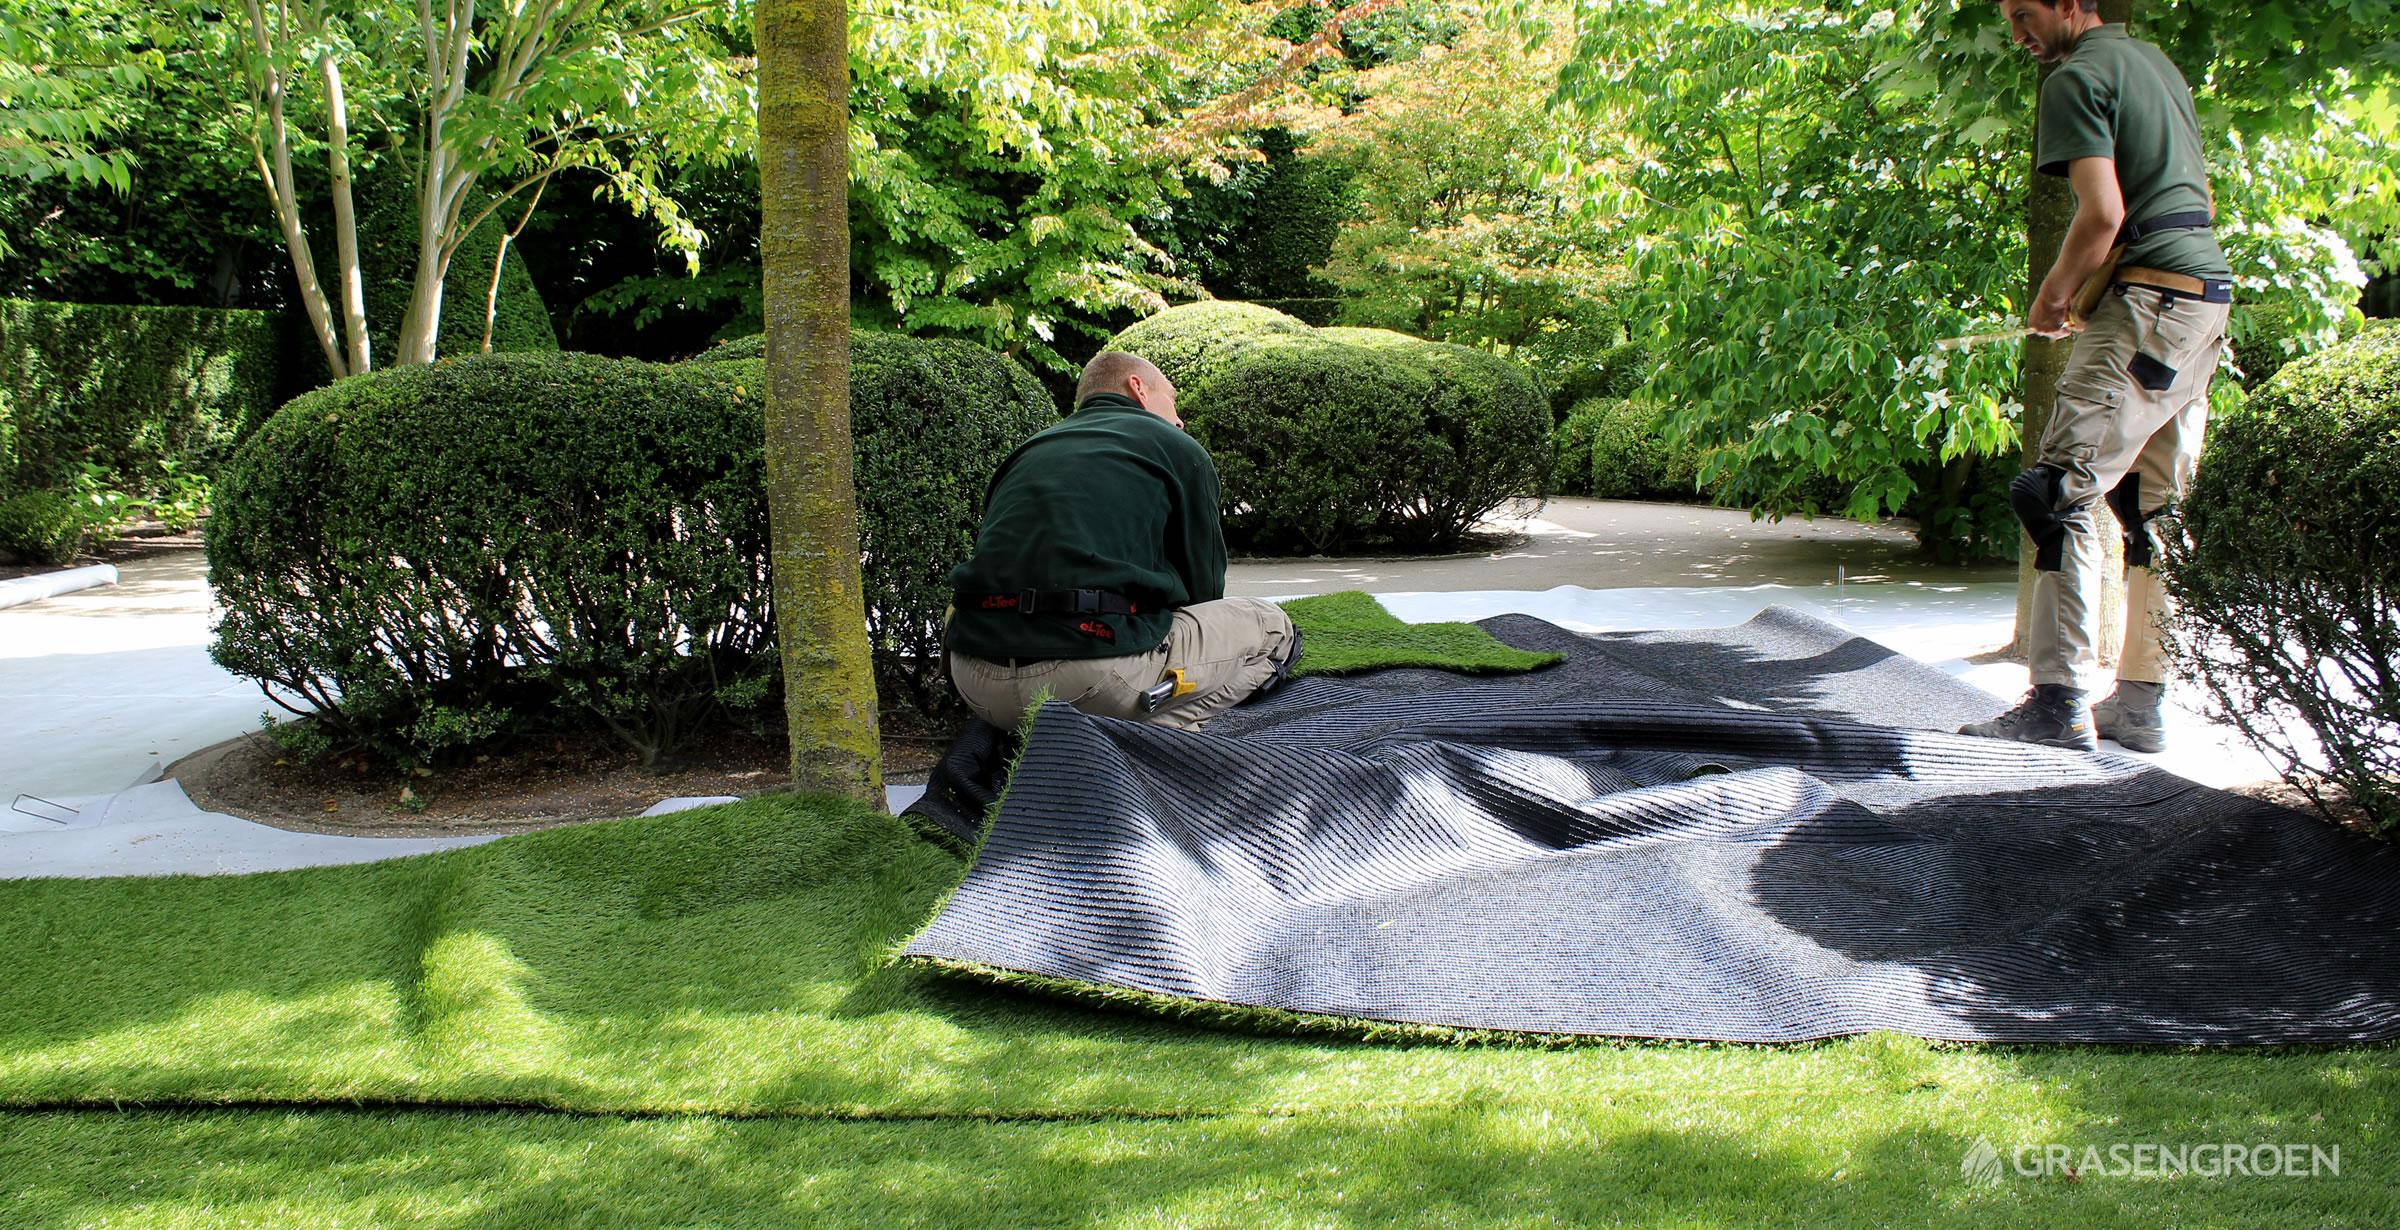 Kunstgrasleggenverlijmenslider0 • Gras en Groen Kunstgras